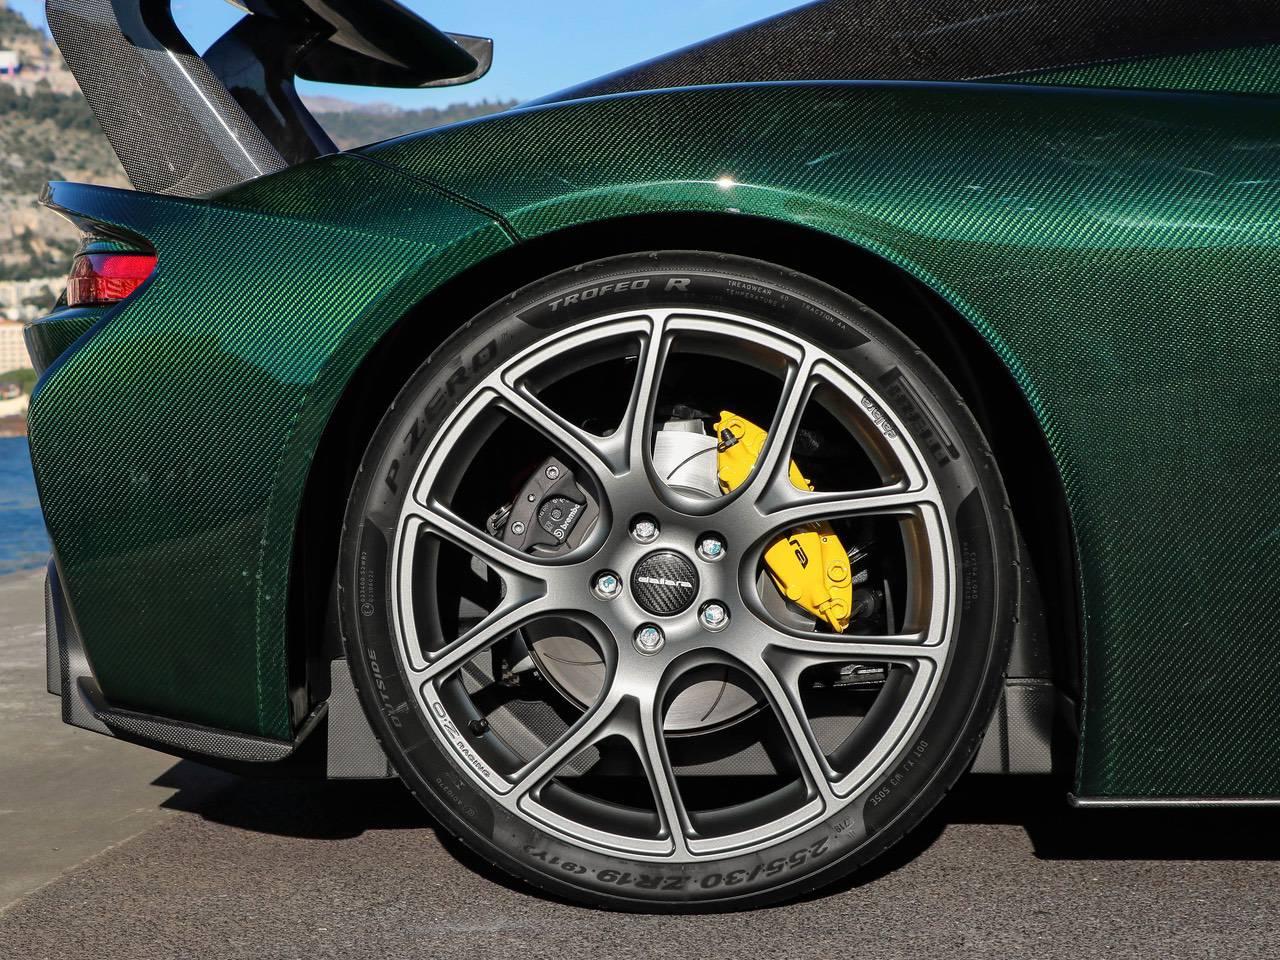 Dallara-Stradale-Convertible-Carbon-5